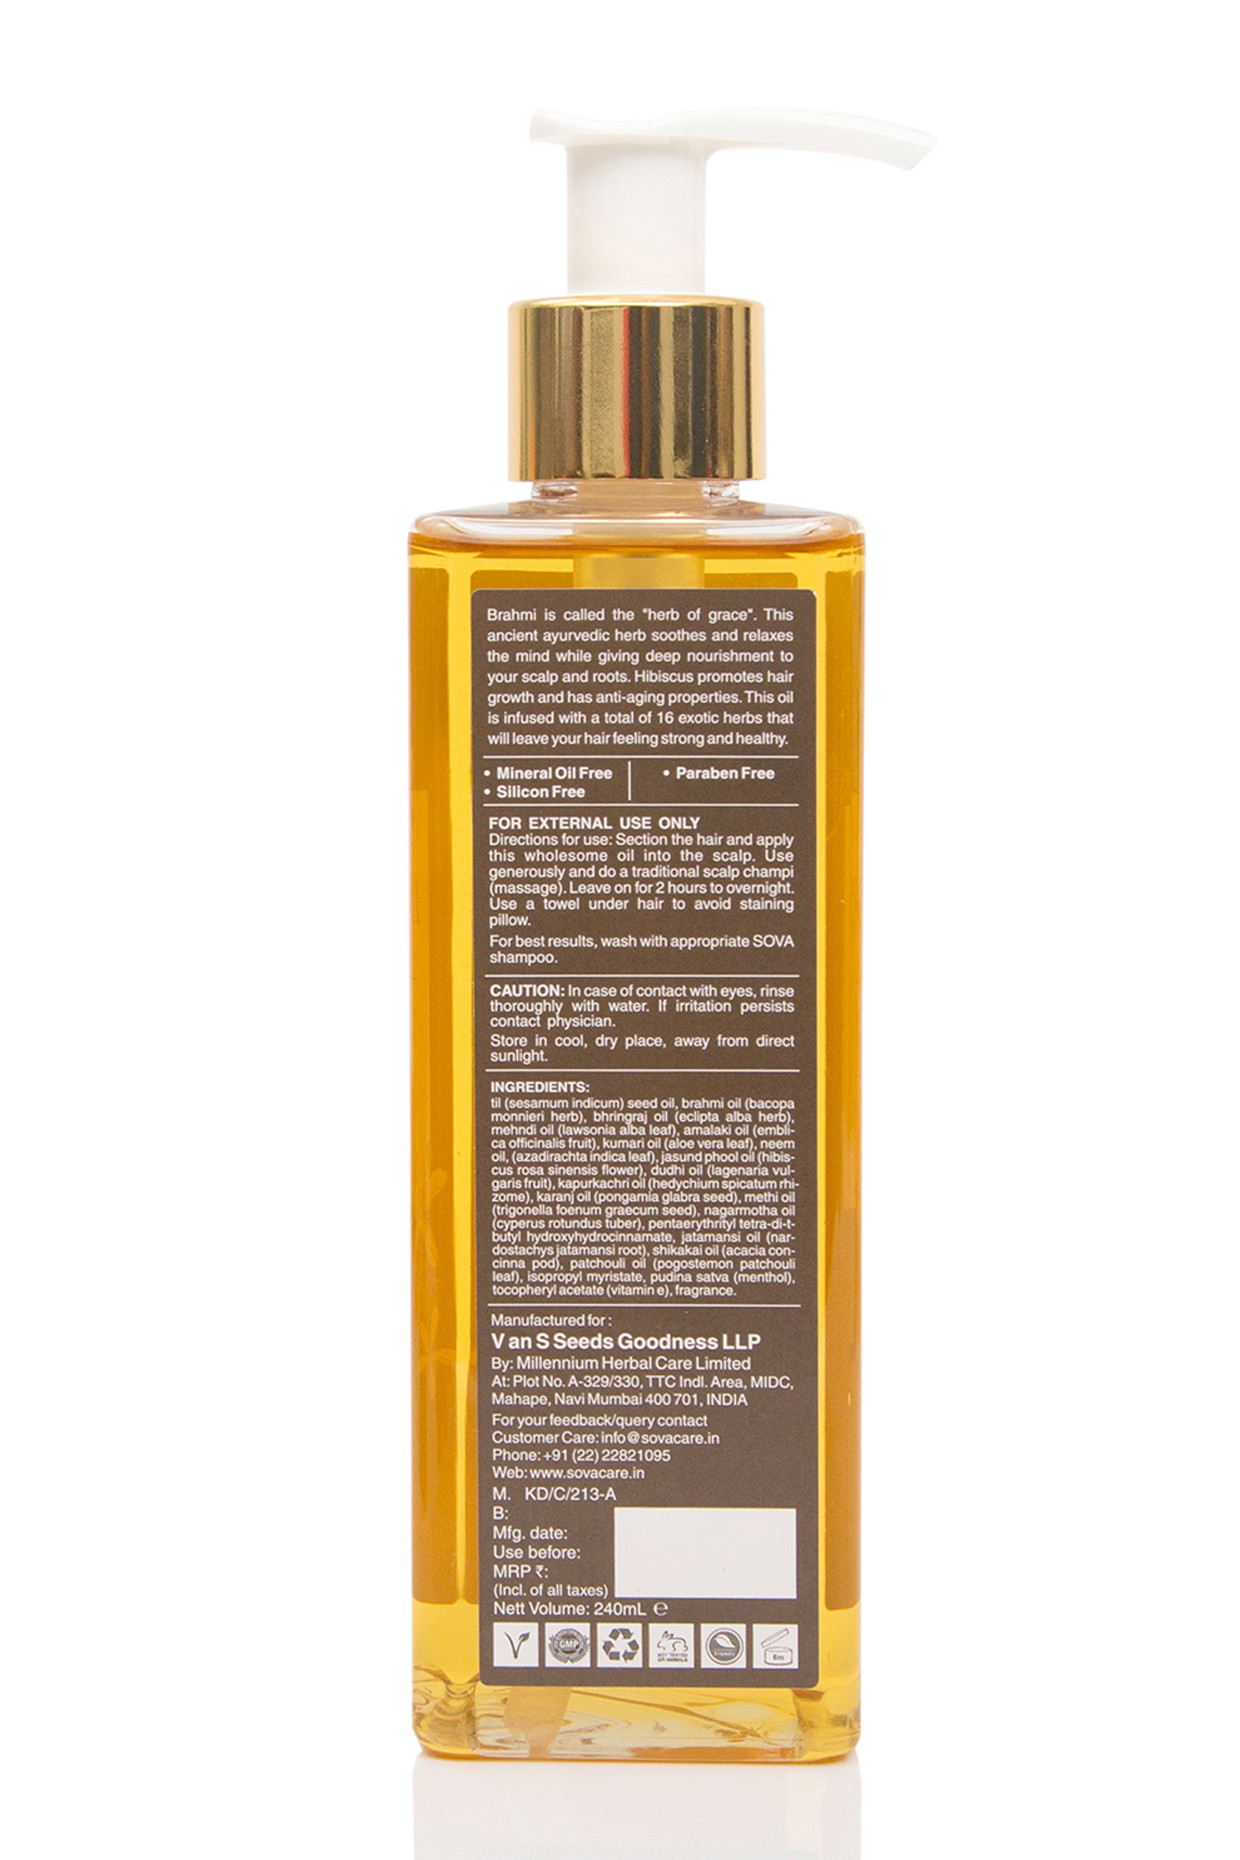 Hibiscus & Brahmi Hair Massage Oil by SOVA